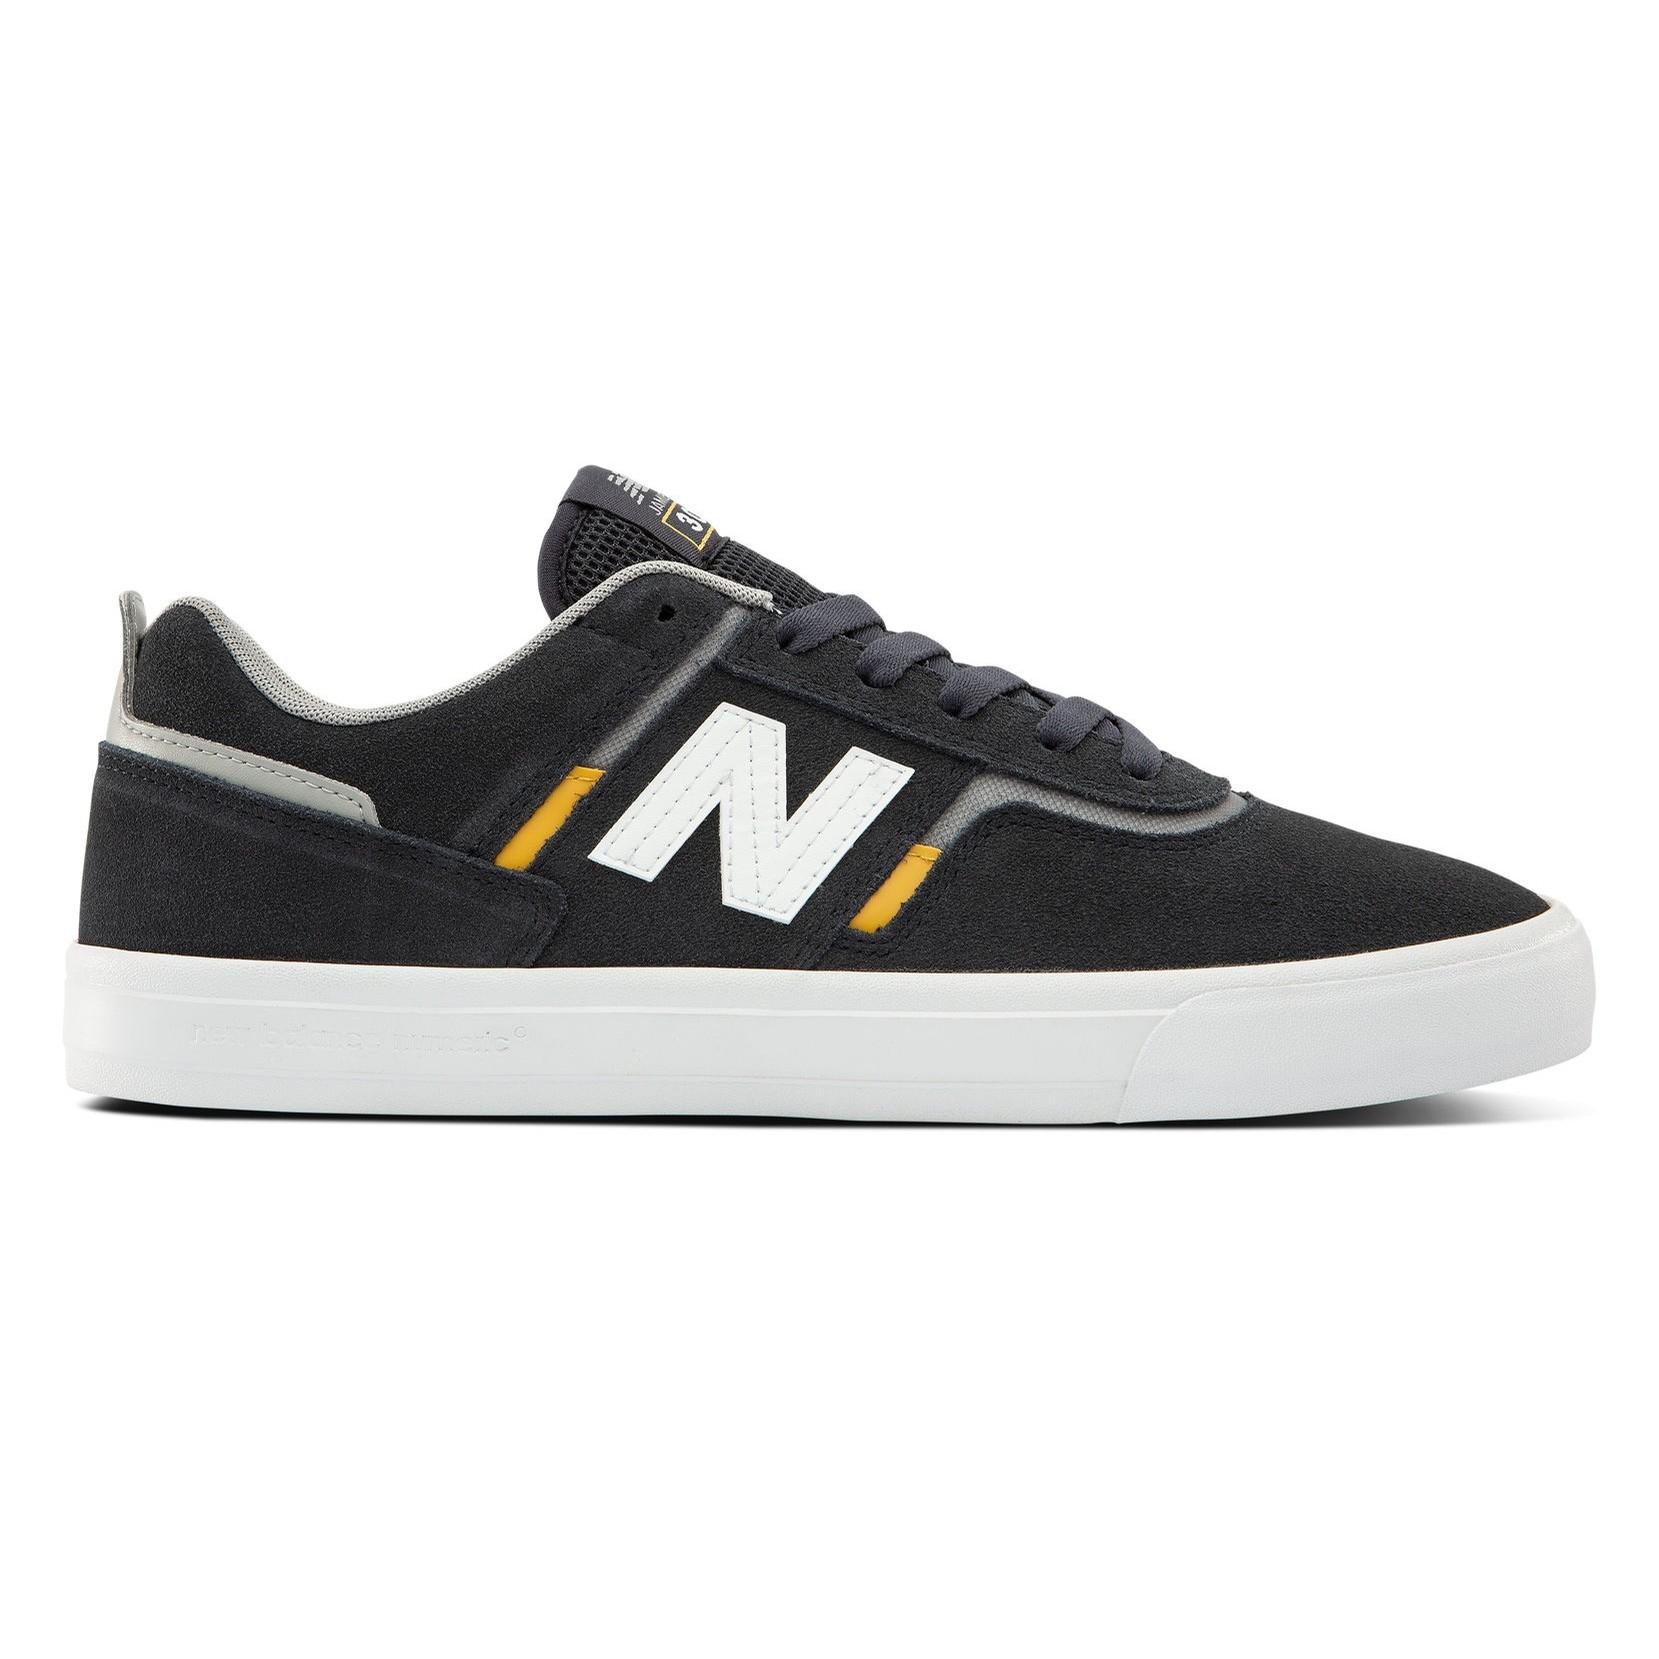 Numeric 306 (Navy/White)